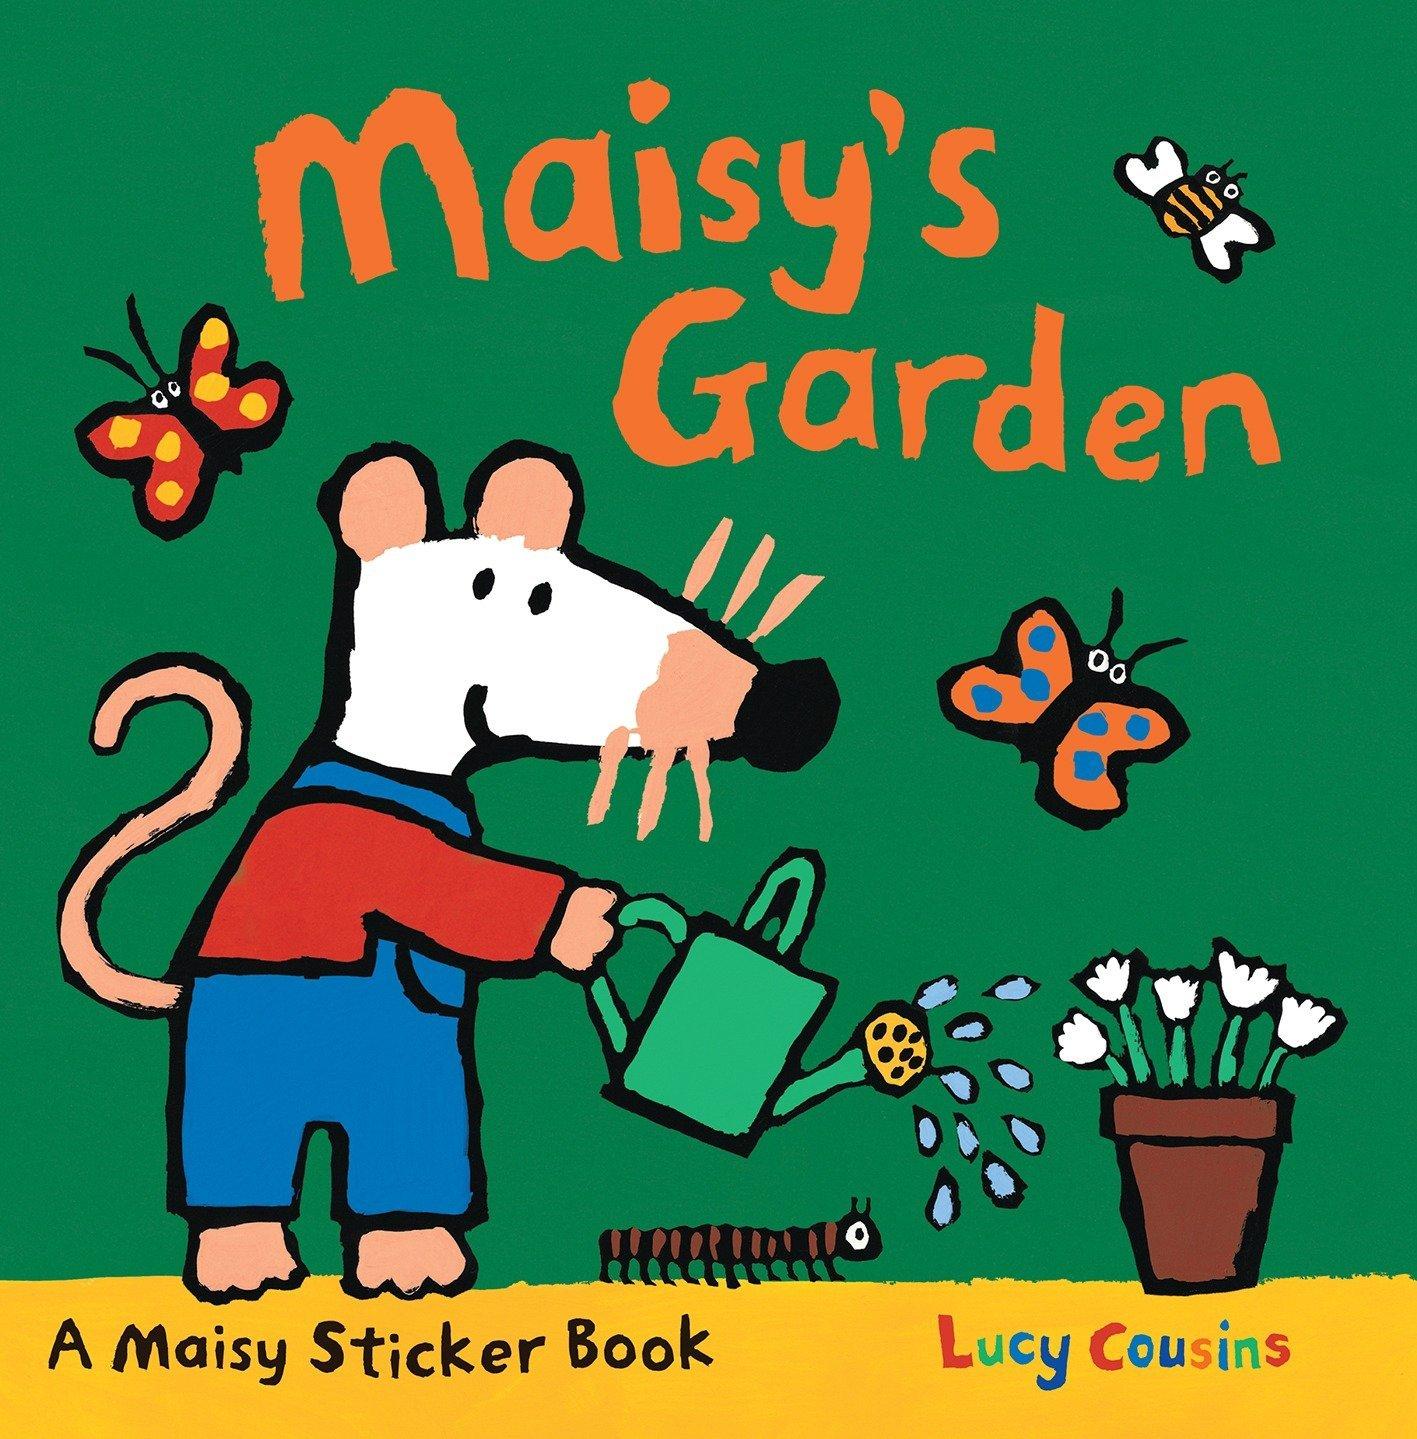 Maisy's Garden: A Sticker Book: Amazon.co.uk: Lucy Cousins: 9780763659066:  Books